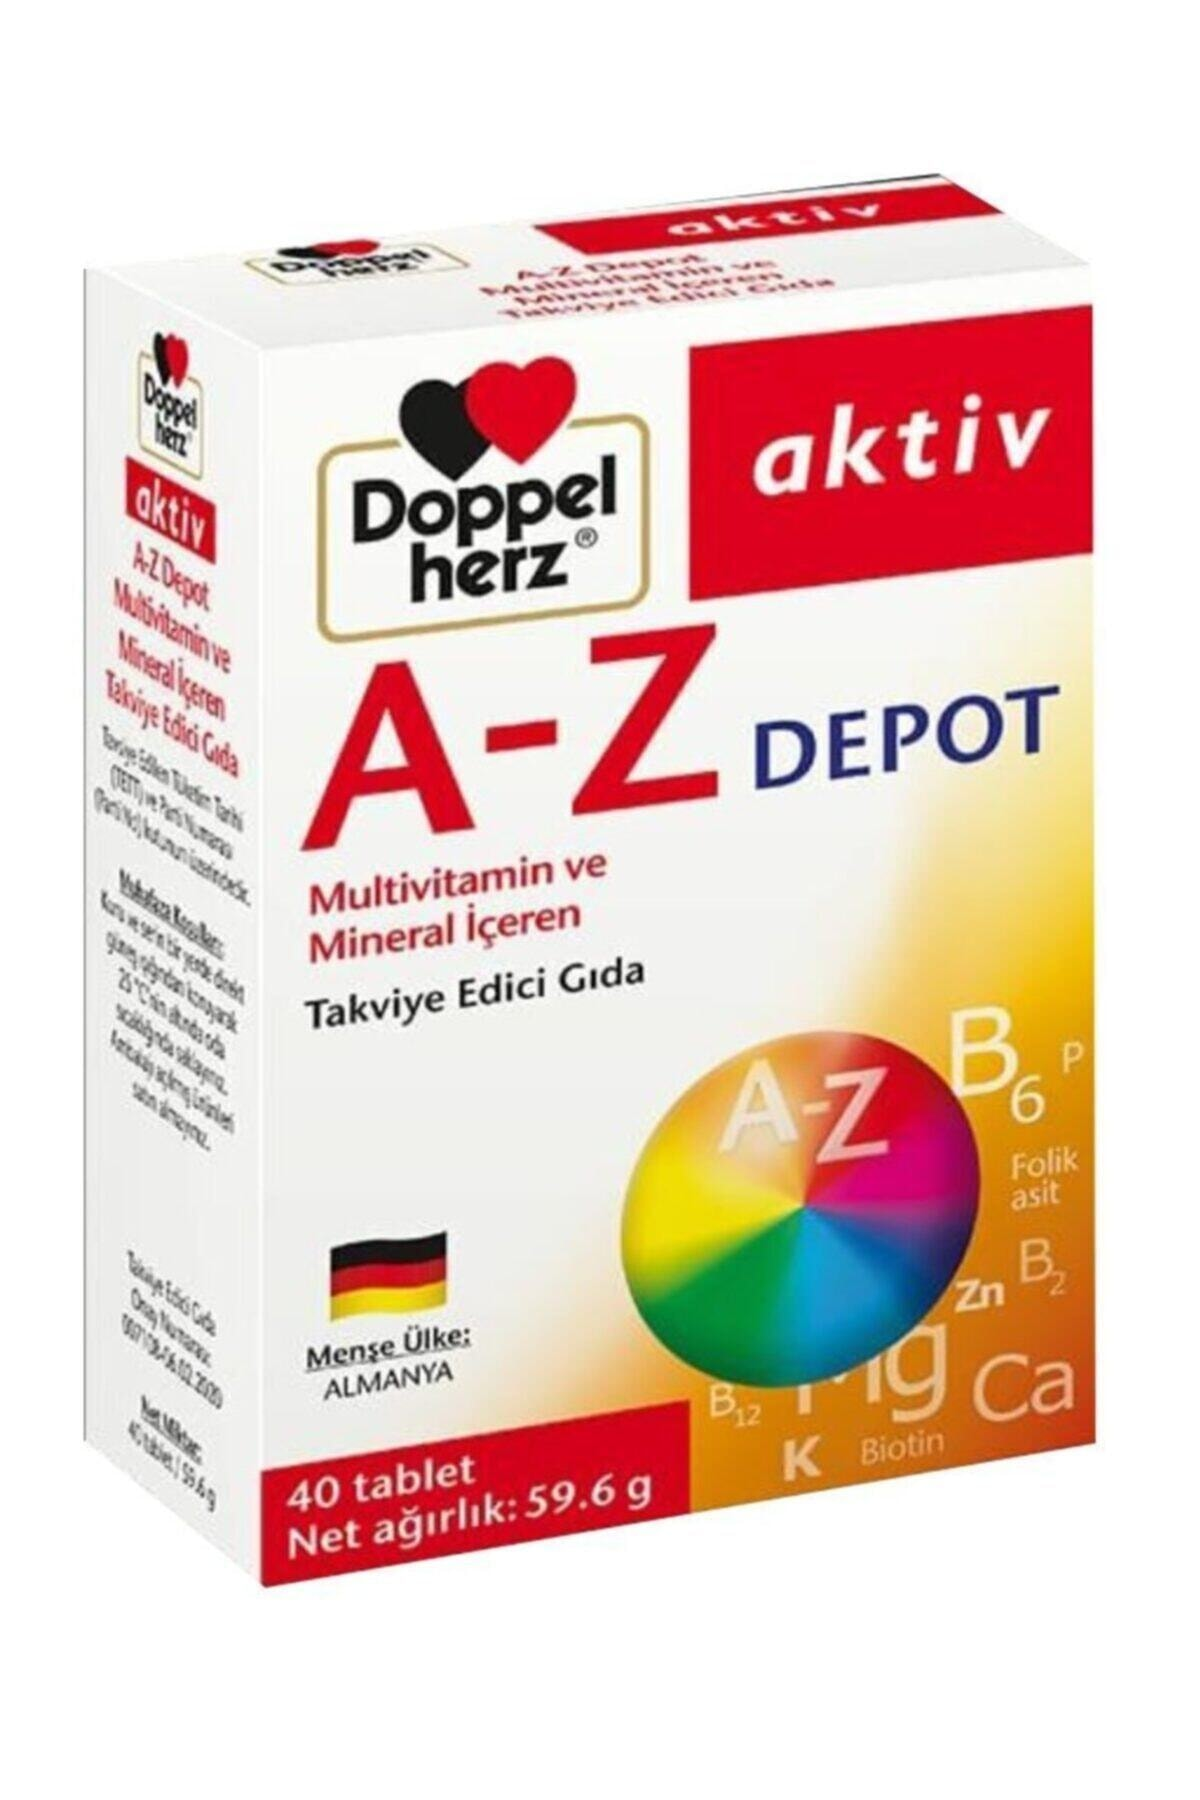 Doppelherz Aktiv A-z Depot Multivitamin 40 Tablet 1